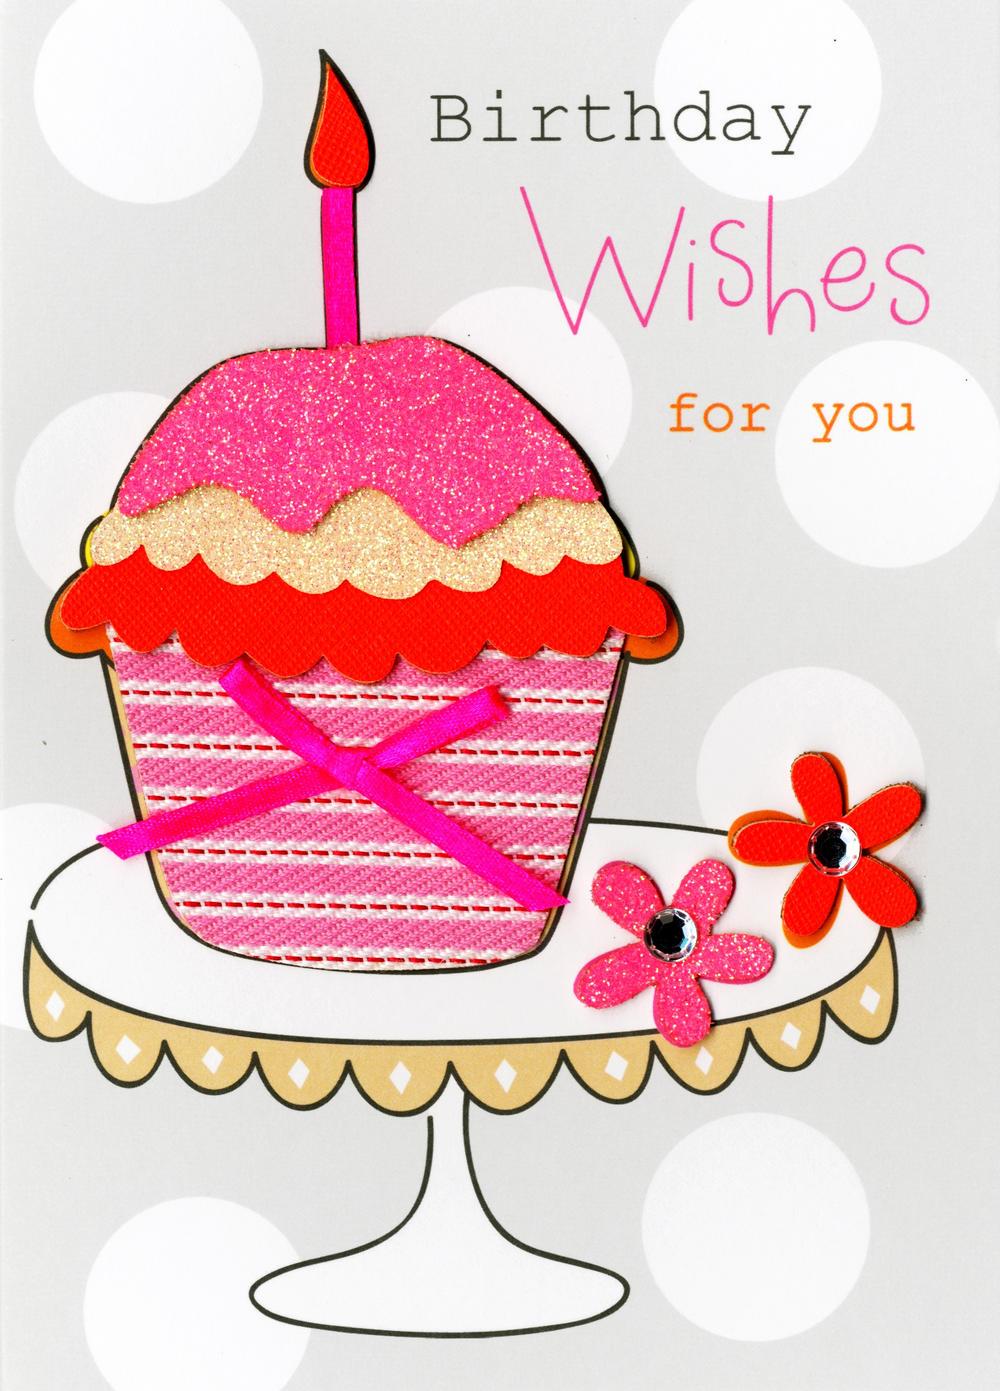 Cupcake Birthday Wishes Embellished Greeting Card